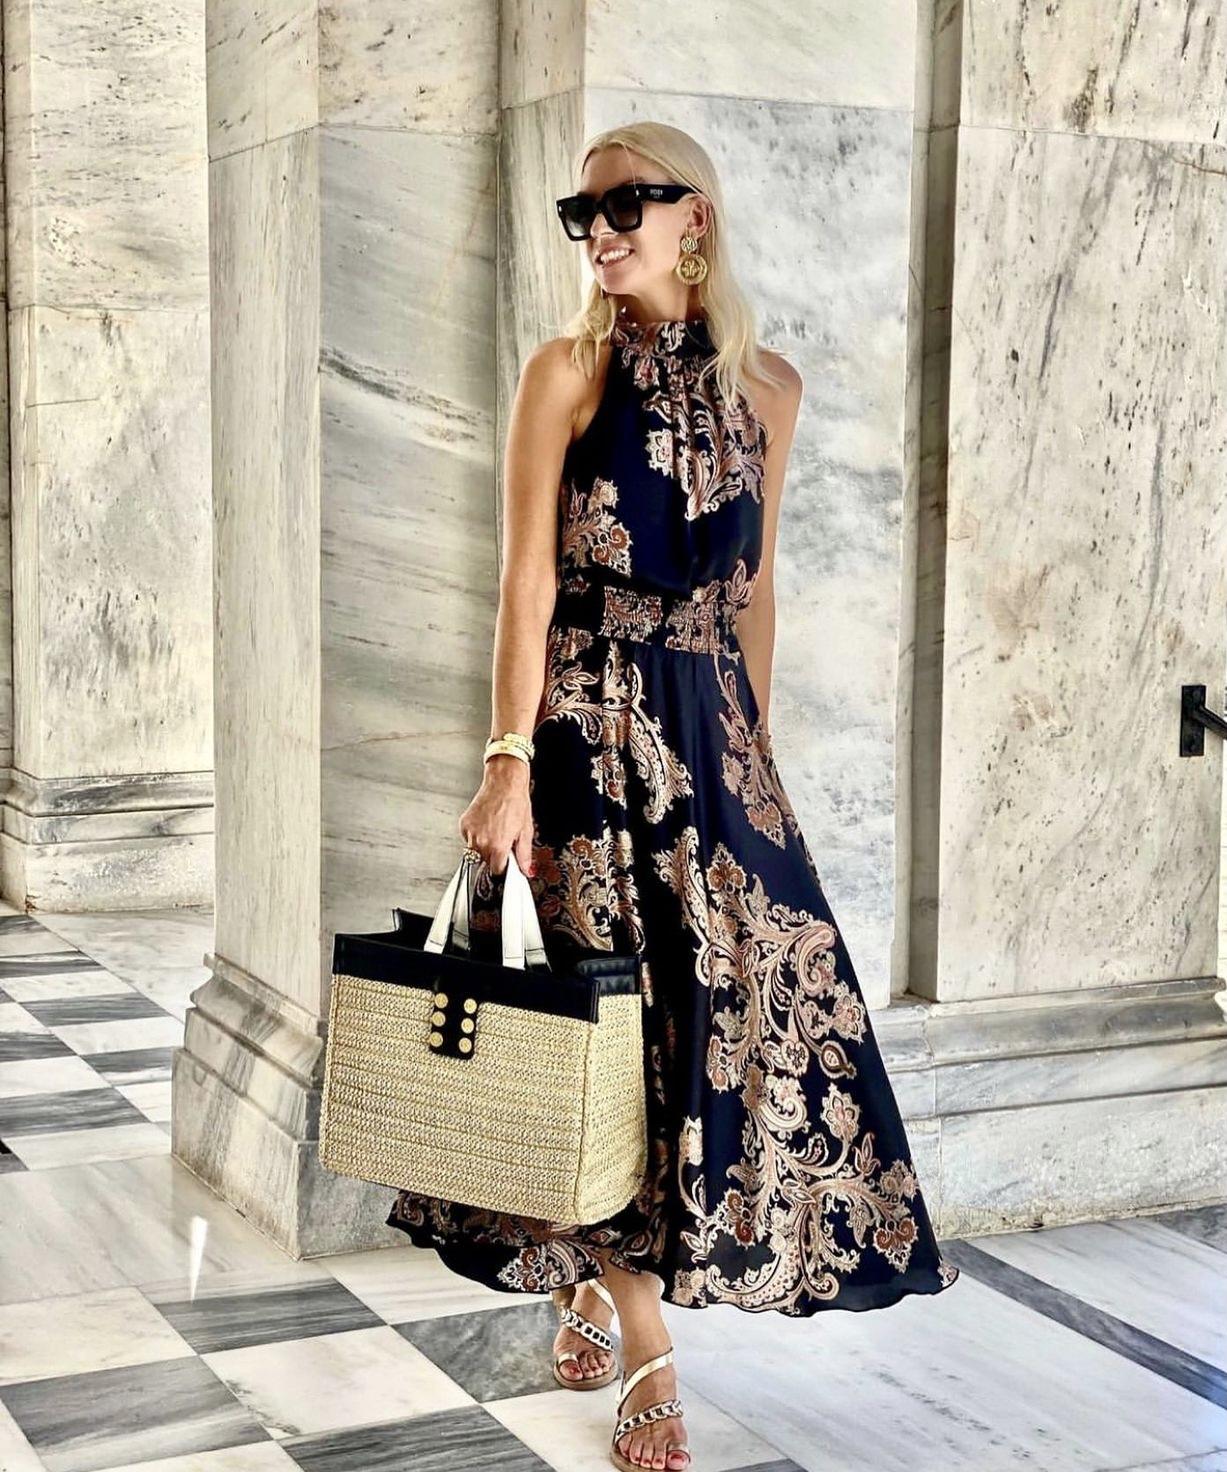 KARMAMIA Eloise Top – Pearson Paisley Blush IMAGE BY ME